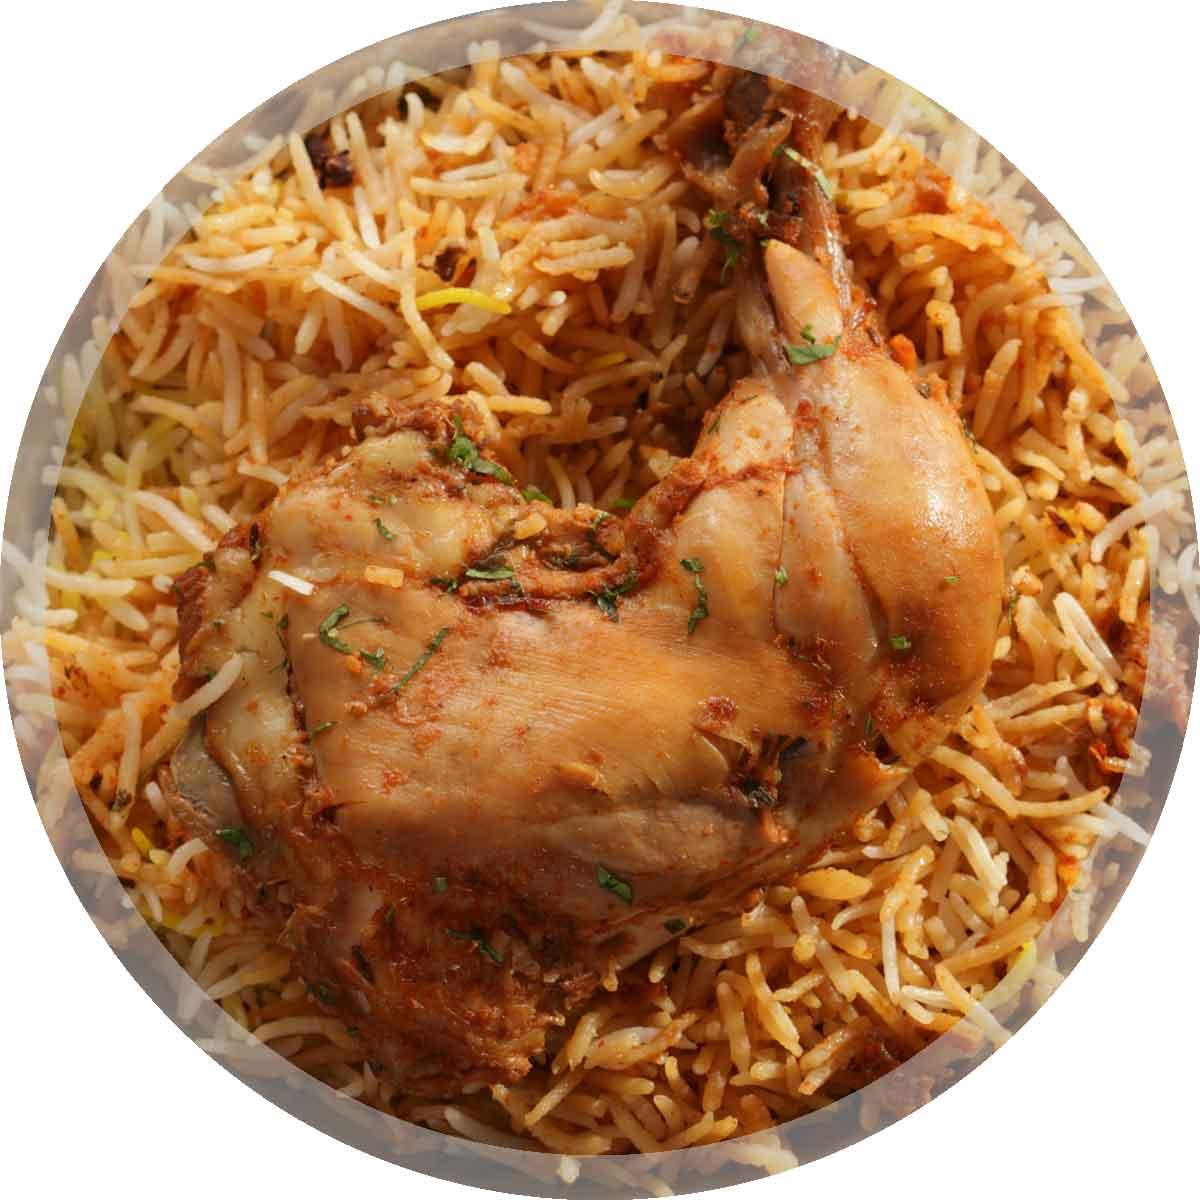 'Arafah Hot Food Distribution | توزيع الوجبات الساخنة في عرفة